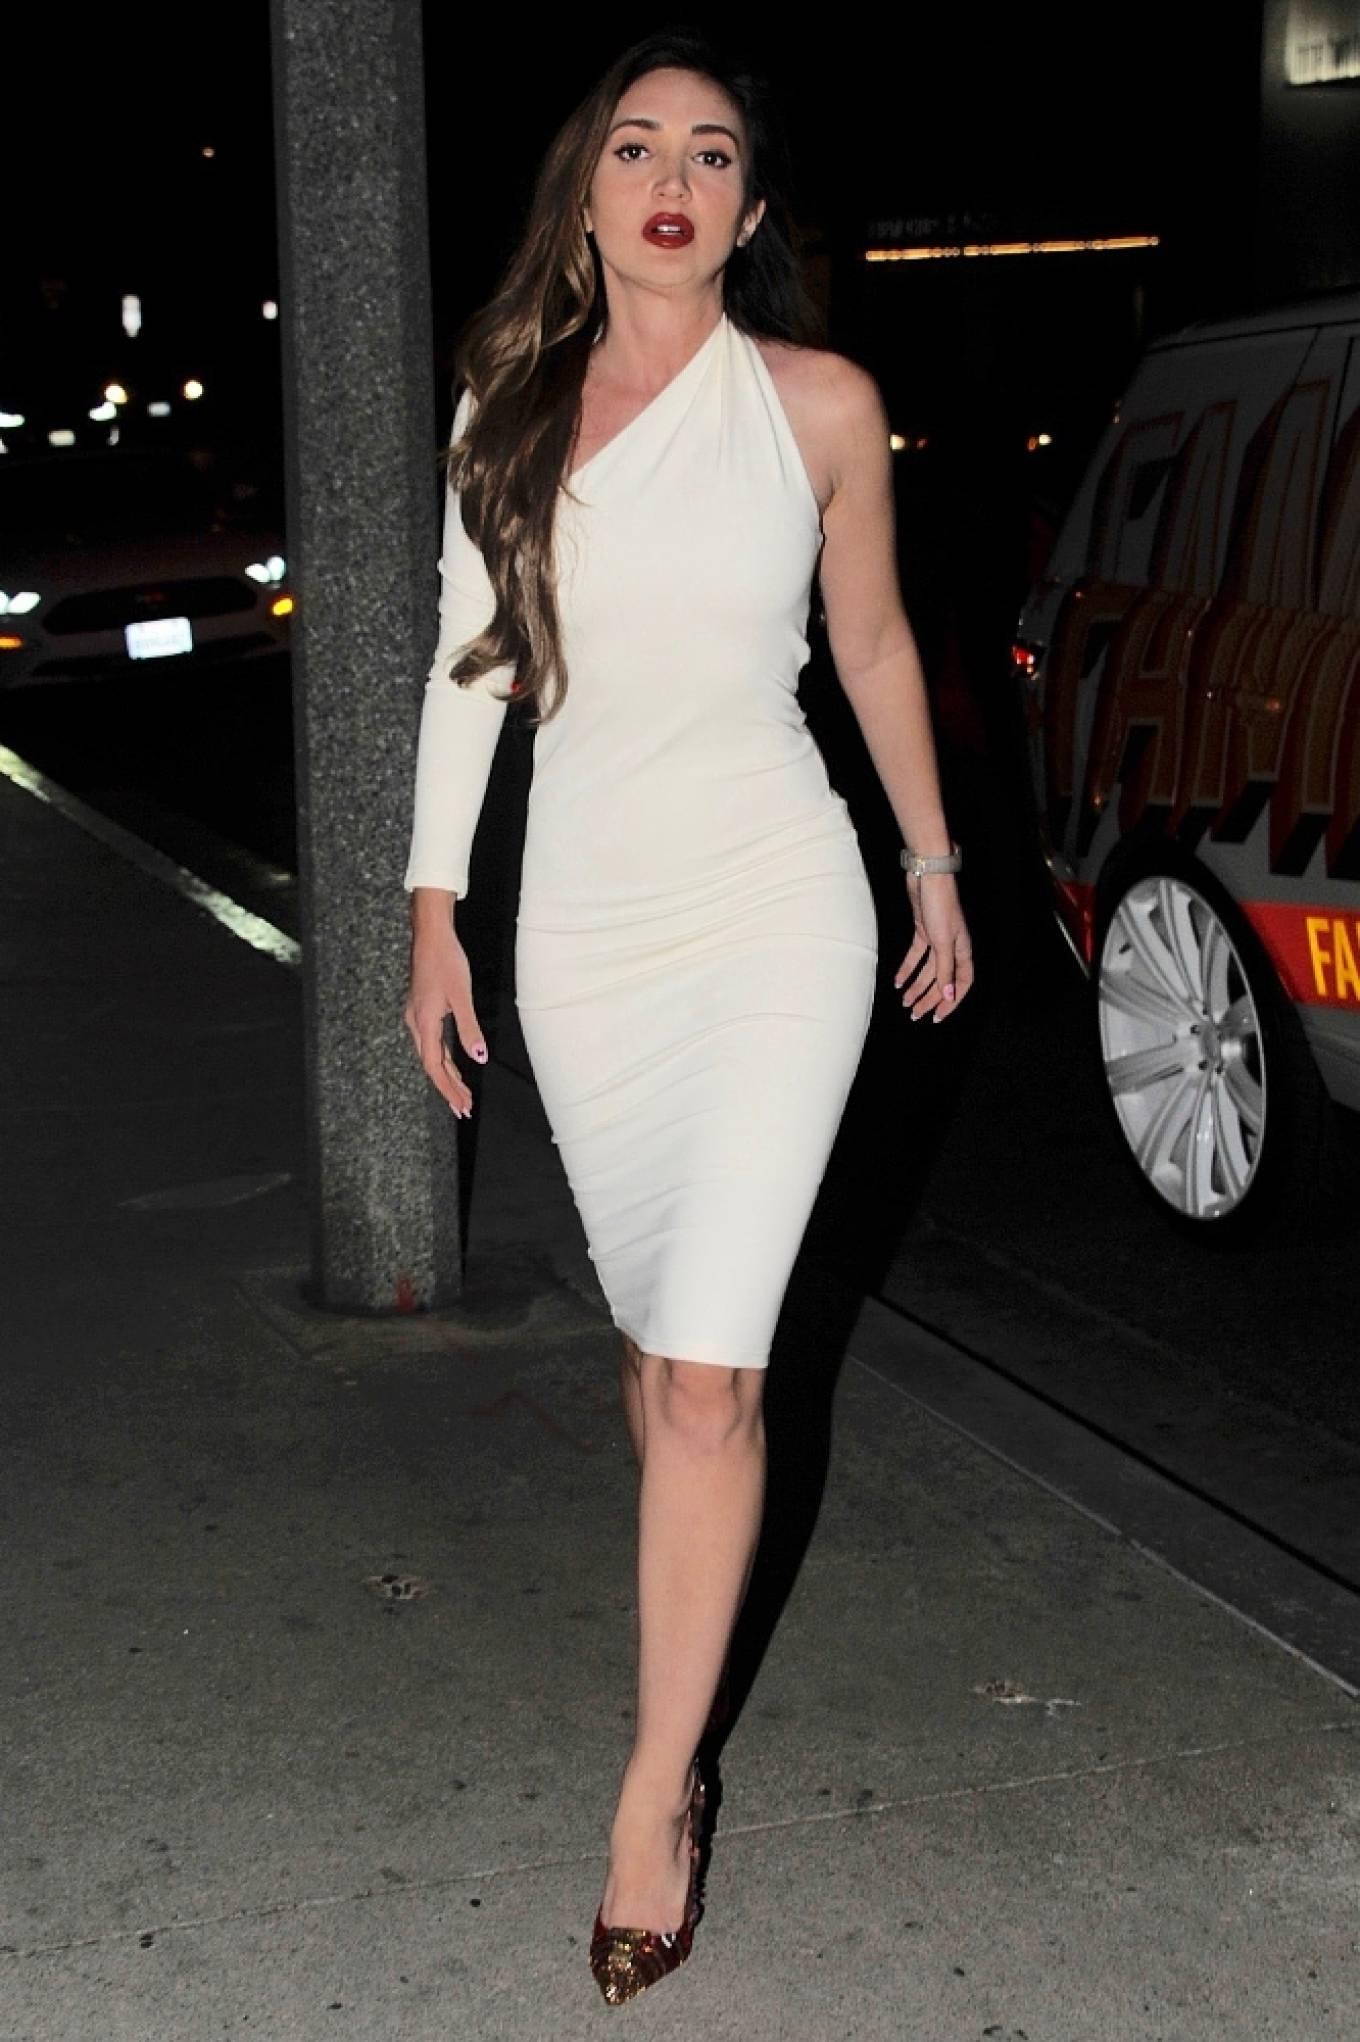 Megan Pormer 2021 : Megan Pormer – In white tight dress going to Nusr-Et Steakhouse in Beverly Hills-04